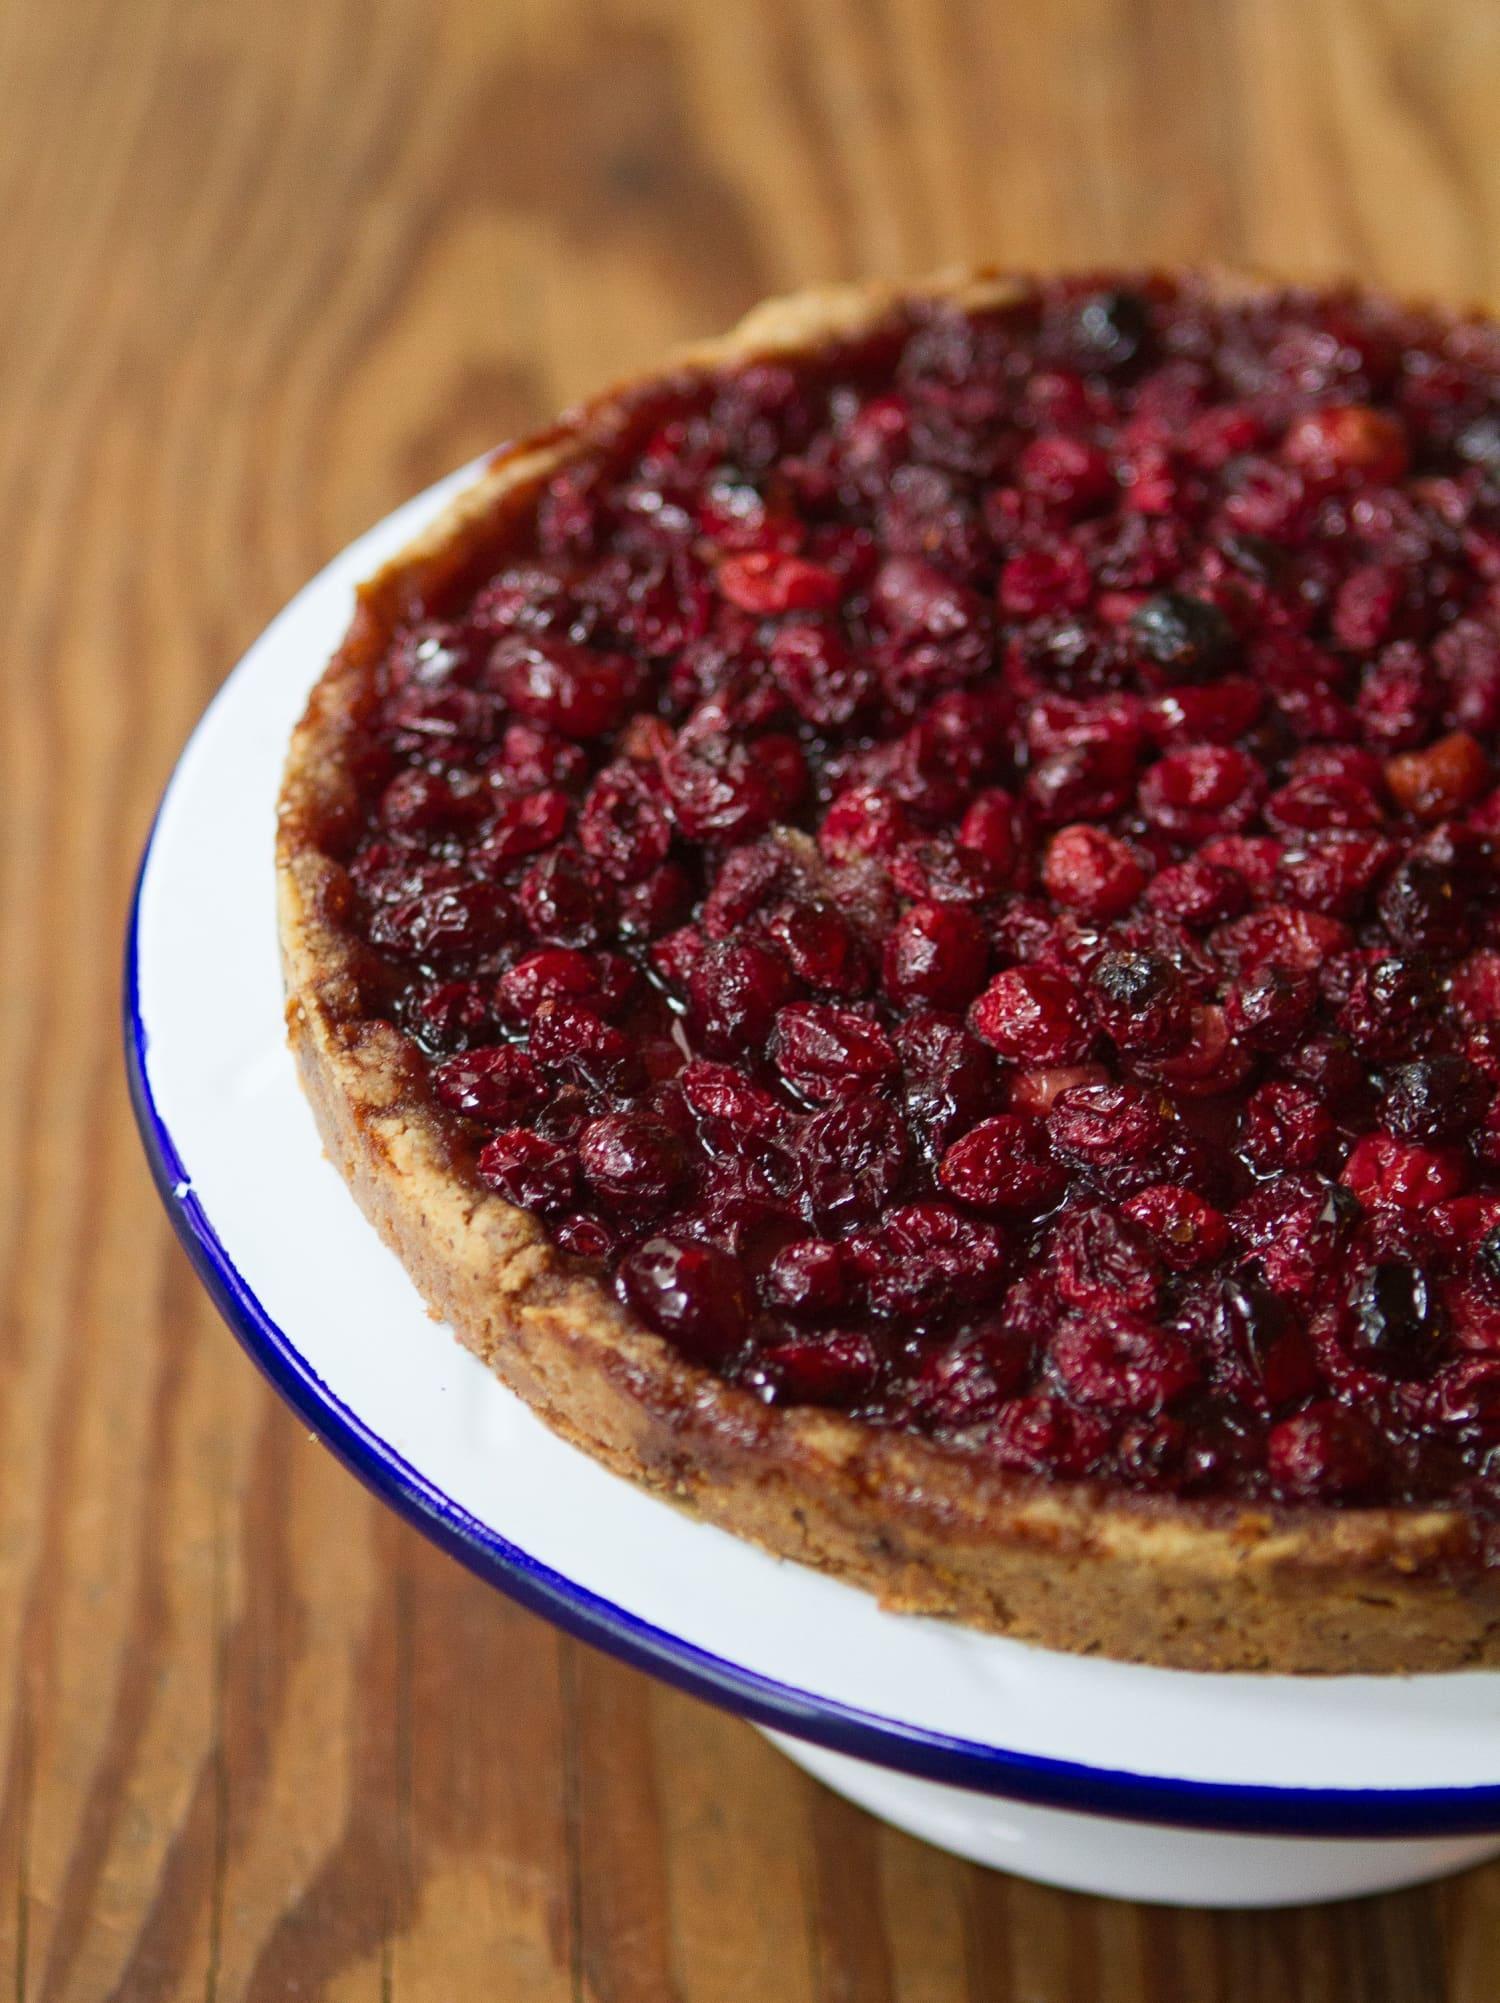 Recipe: Cranberry Tart with Nut Crust